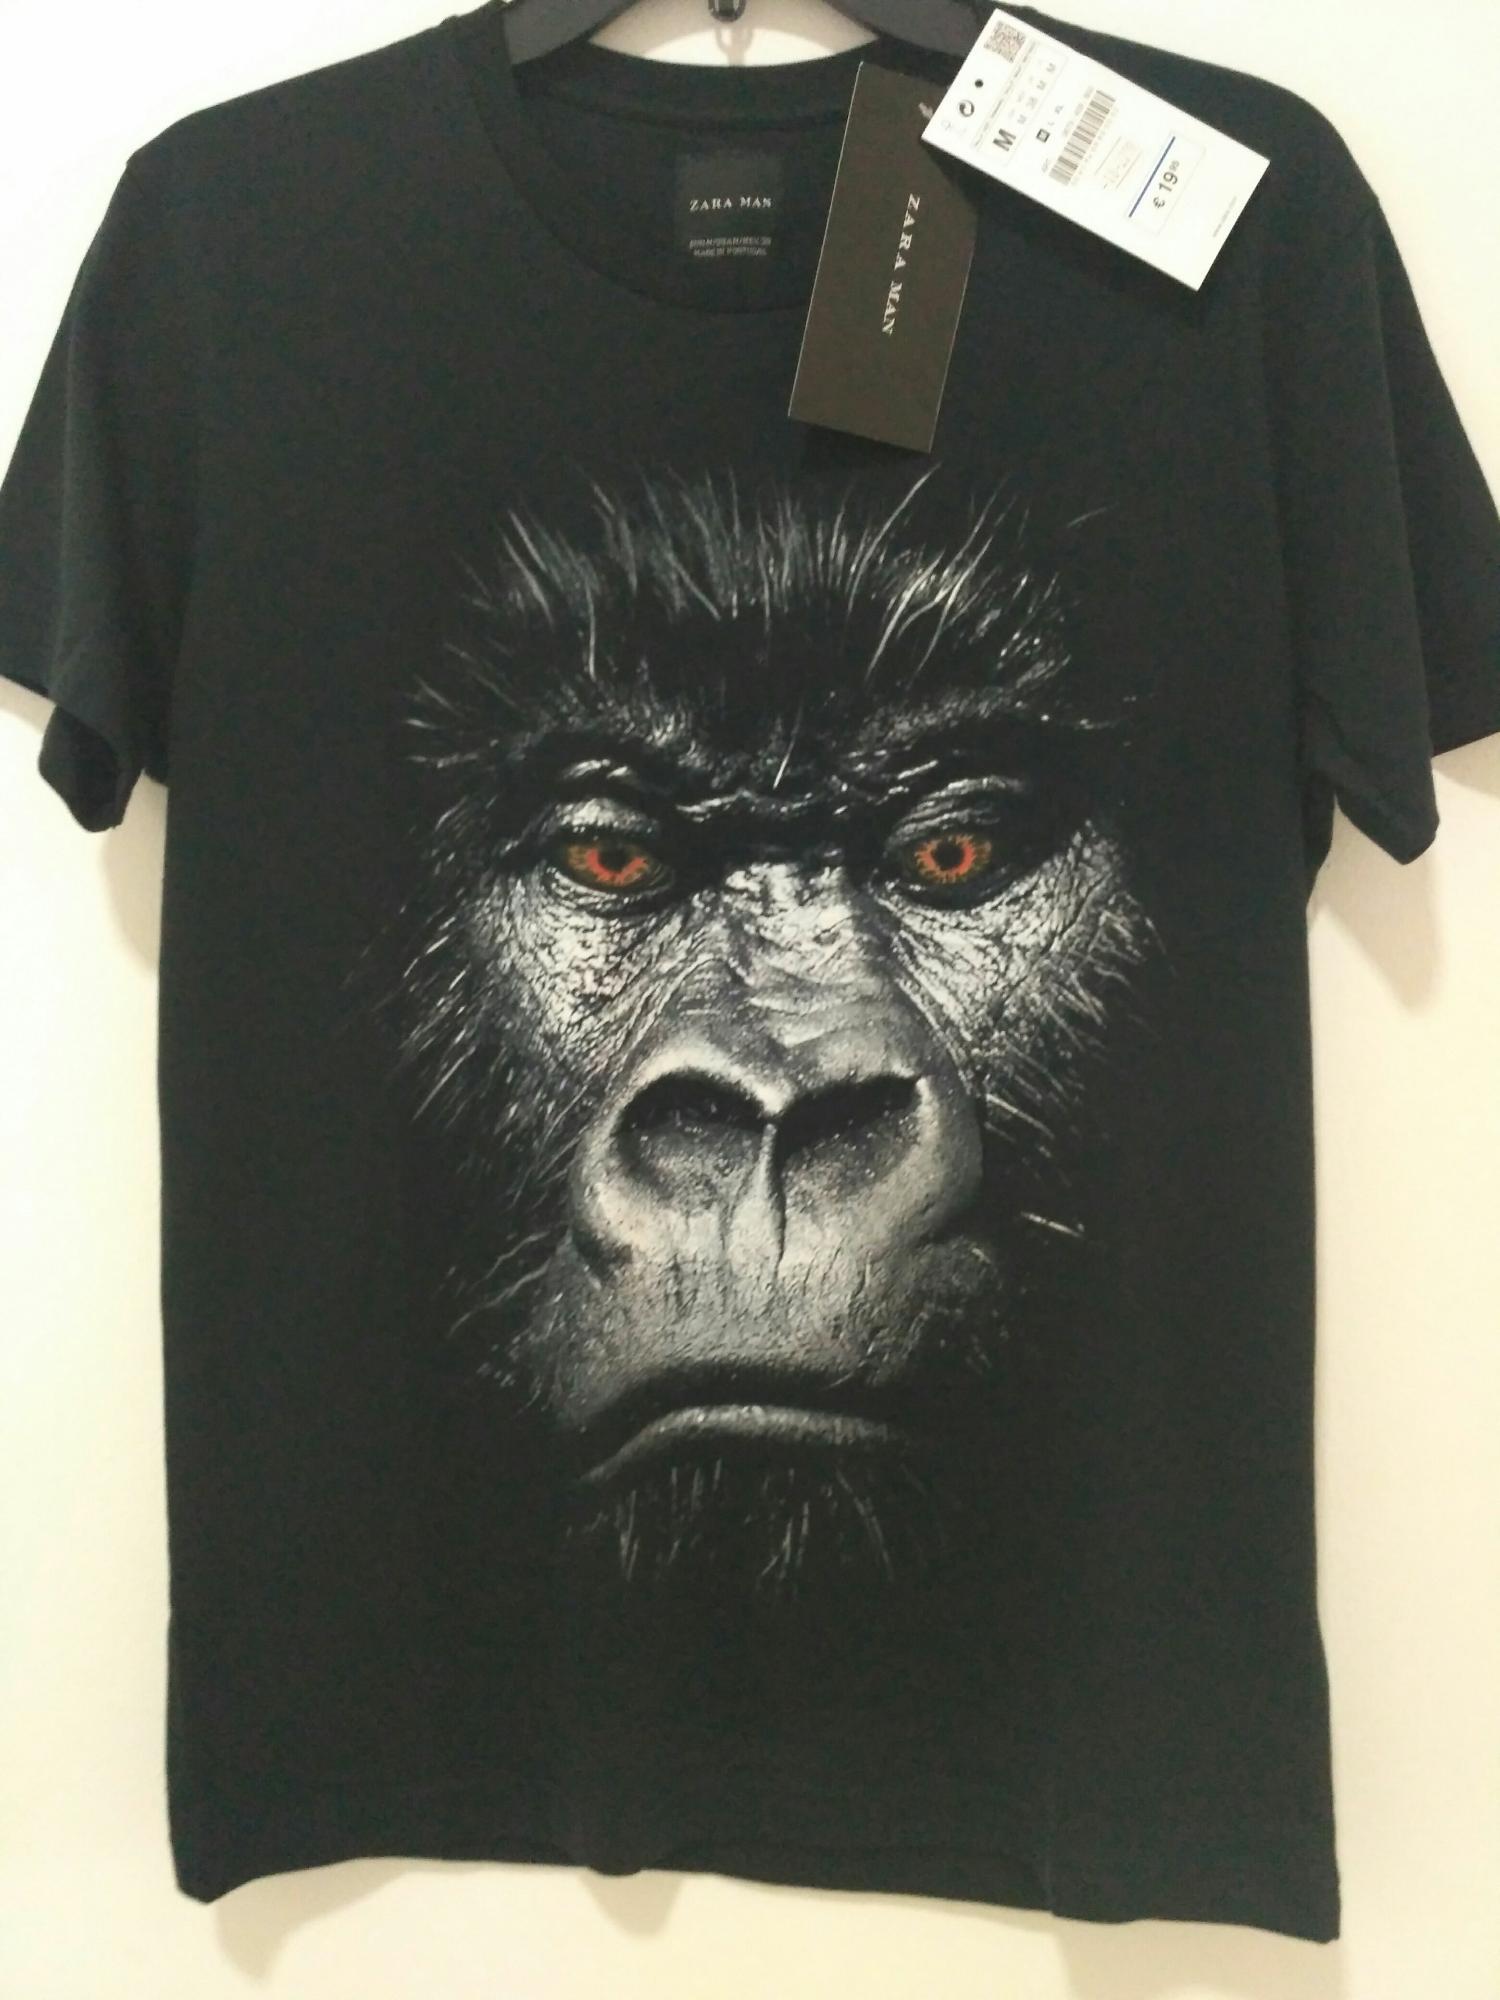 Kaos Zara man animal 0032